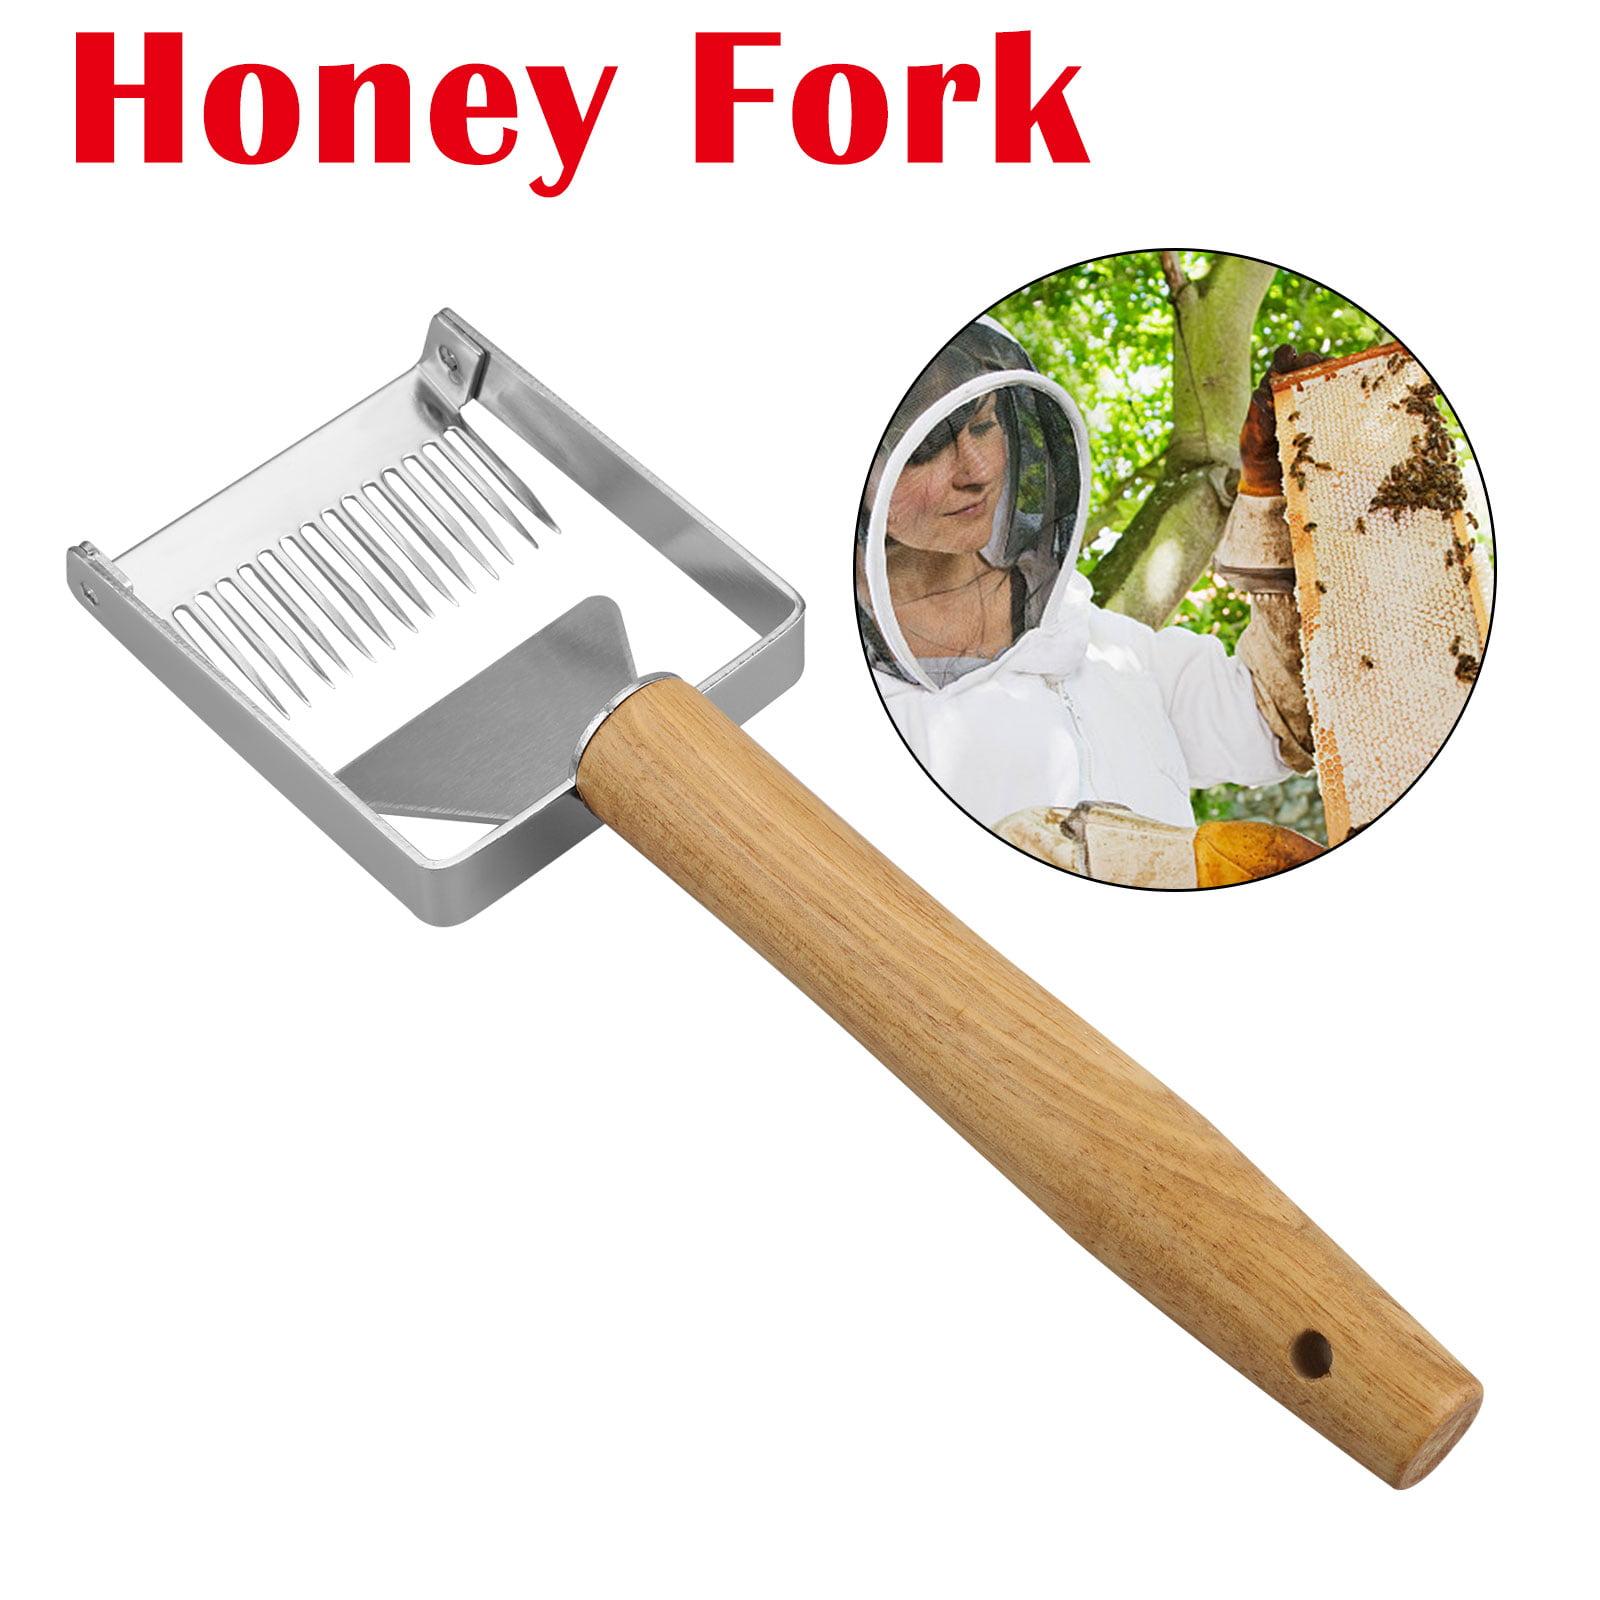 Beekeeping Honeycomb Honey Scraper-Food Degree Stainless Steel Blade /& Wood Handle Honey Uncapping Fork Honey Frame Uncapping Equipment